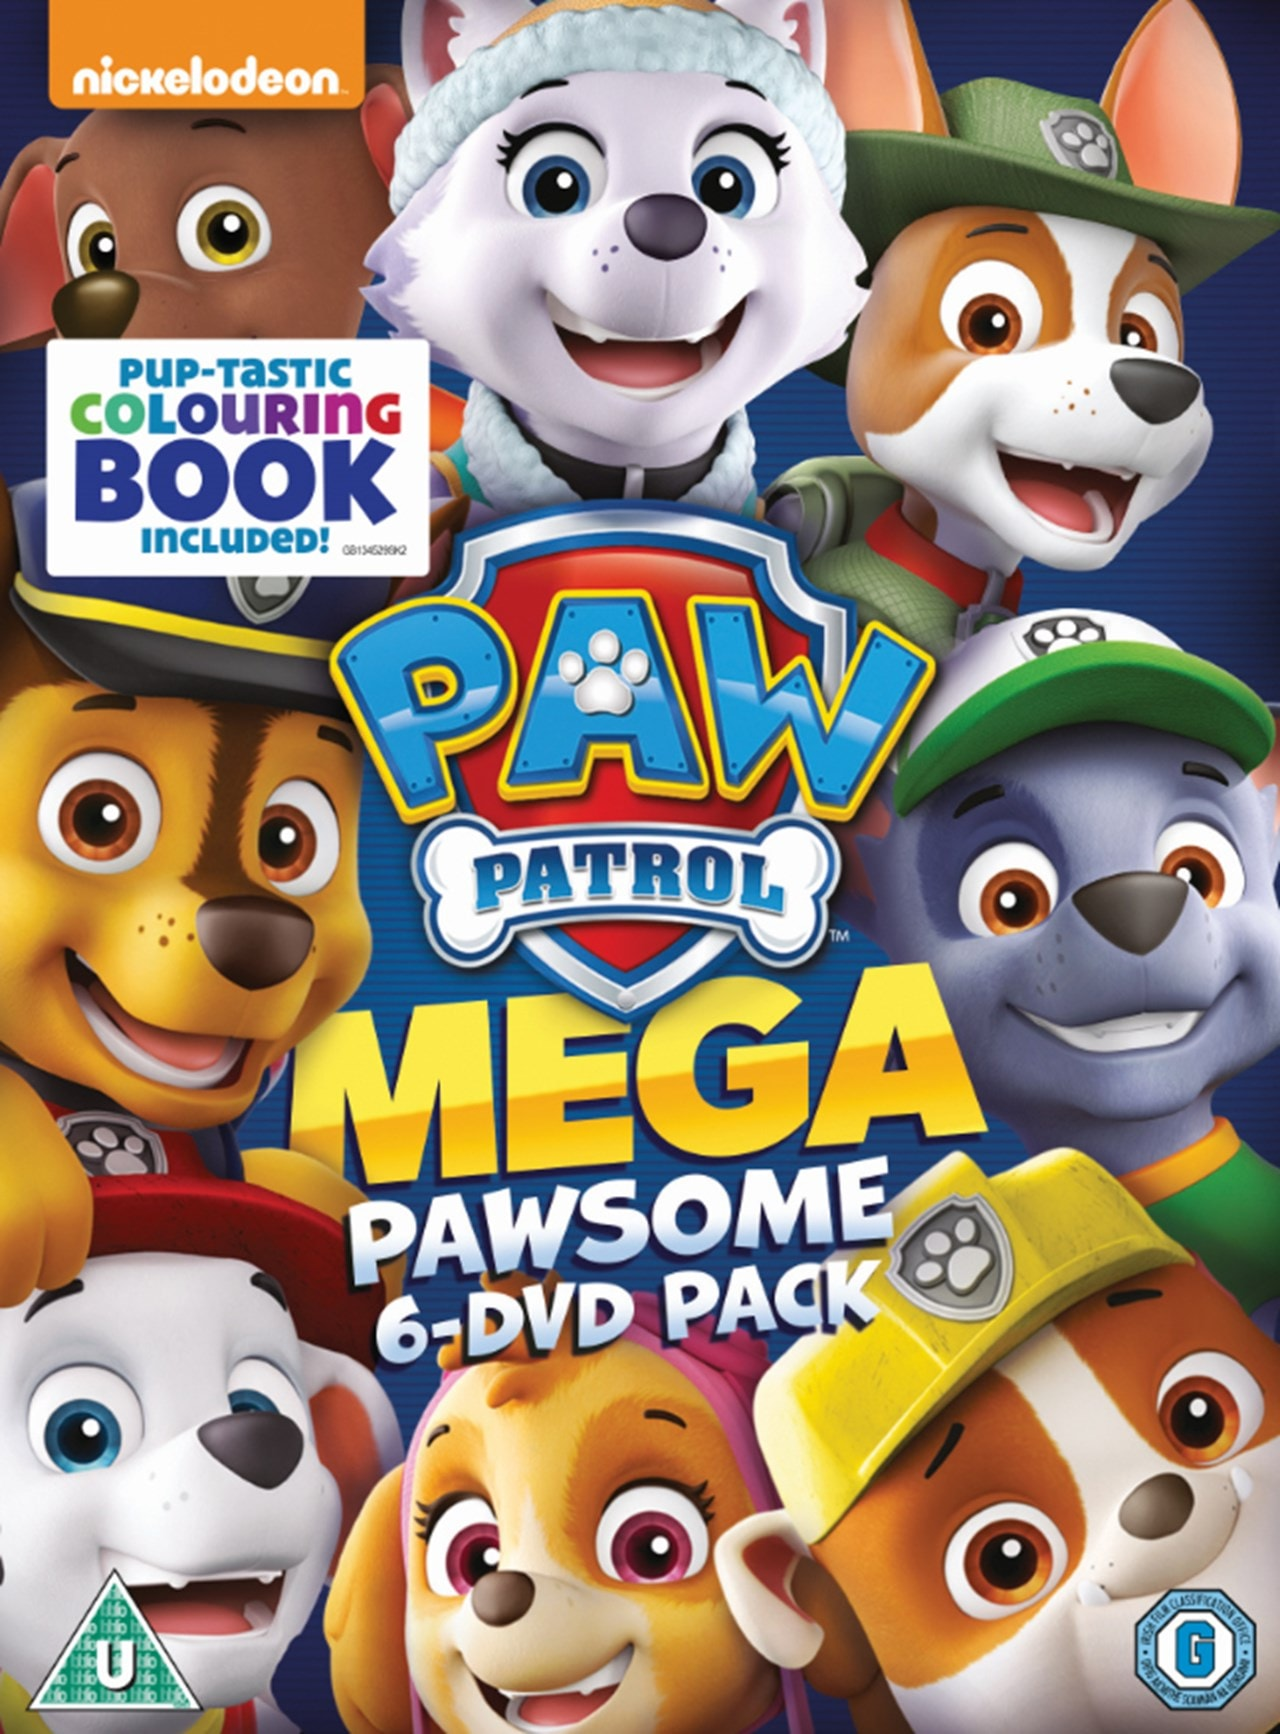 Paw Patrol: Mega Pawsome Pack - 1